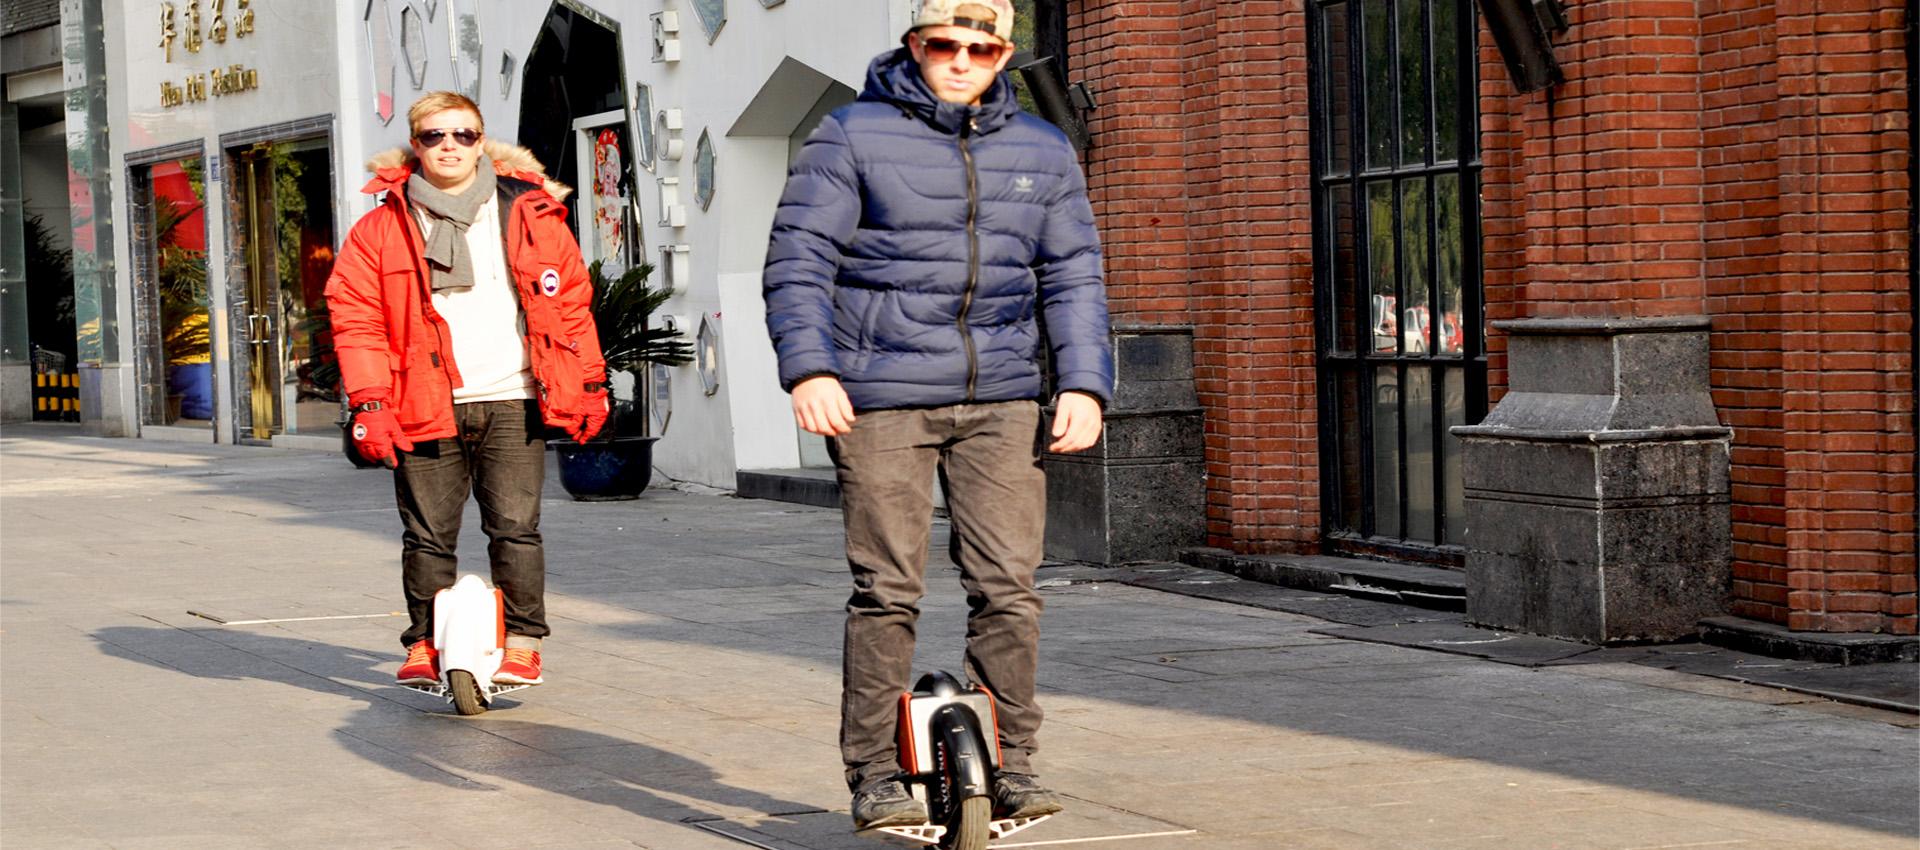 Fosjoas electric scooter